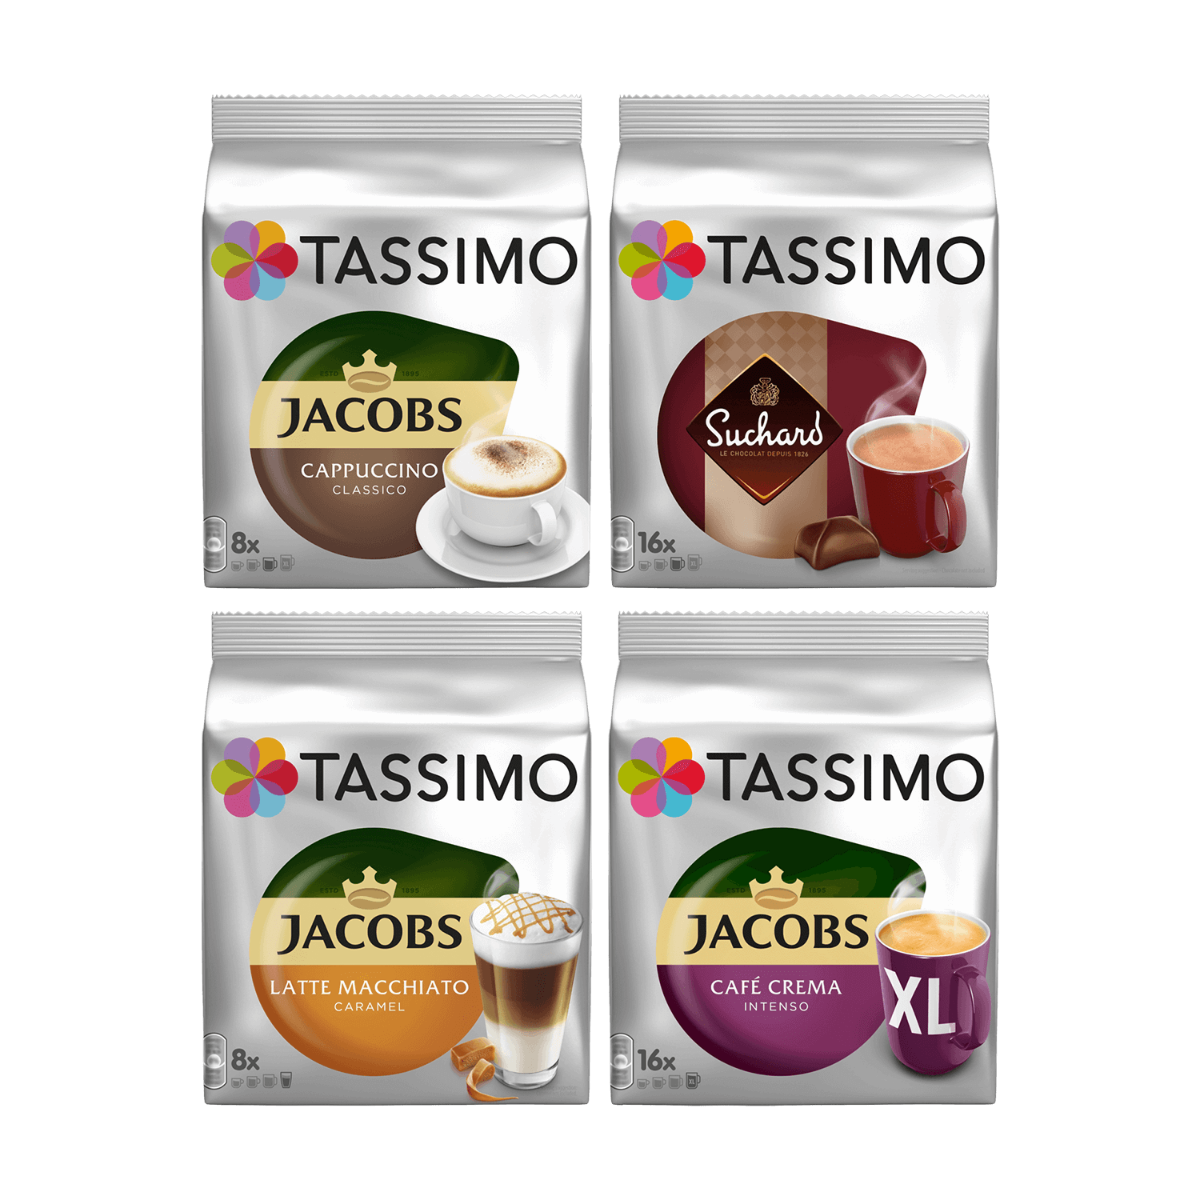 TASSIMO Favoriten-Paket - 4 Kaffeepackungen